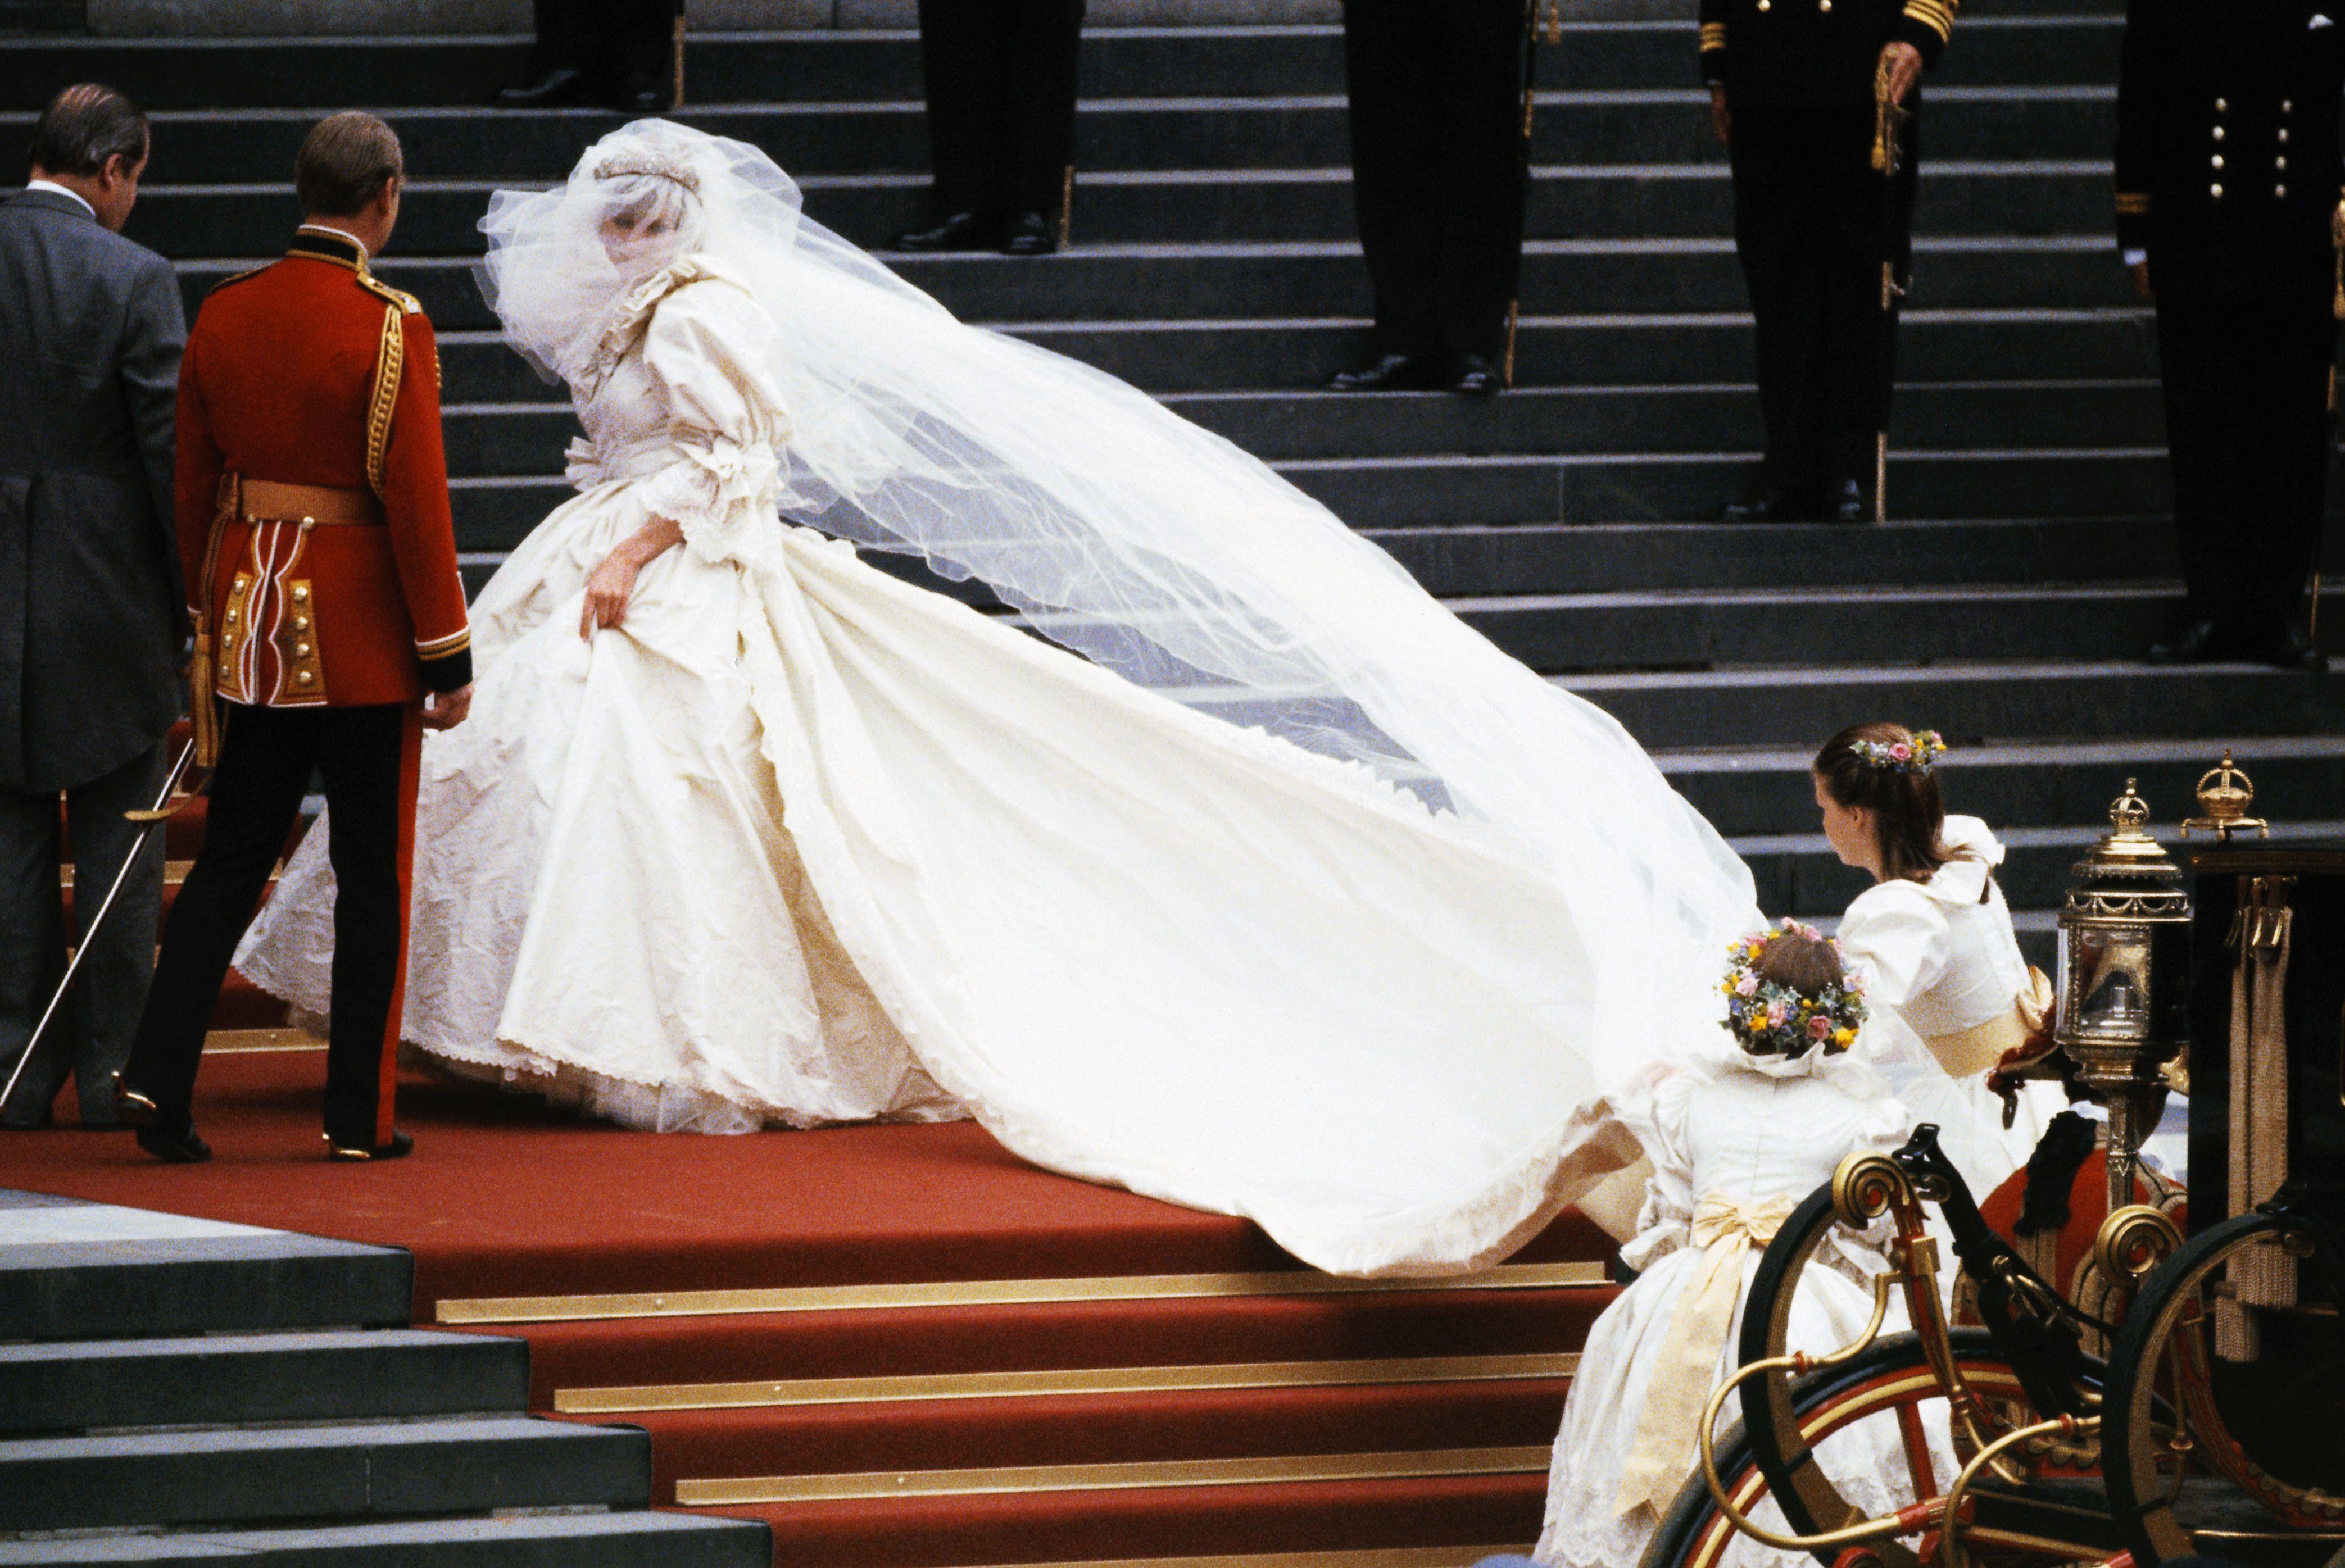 Happy Birthday Princess Diana The Most Iconic Celebrity Bride